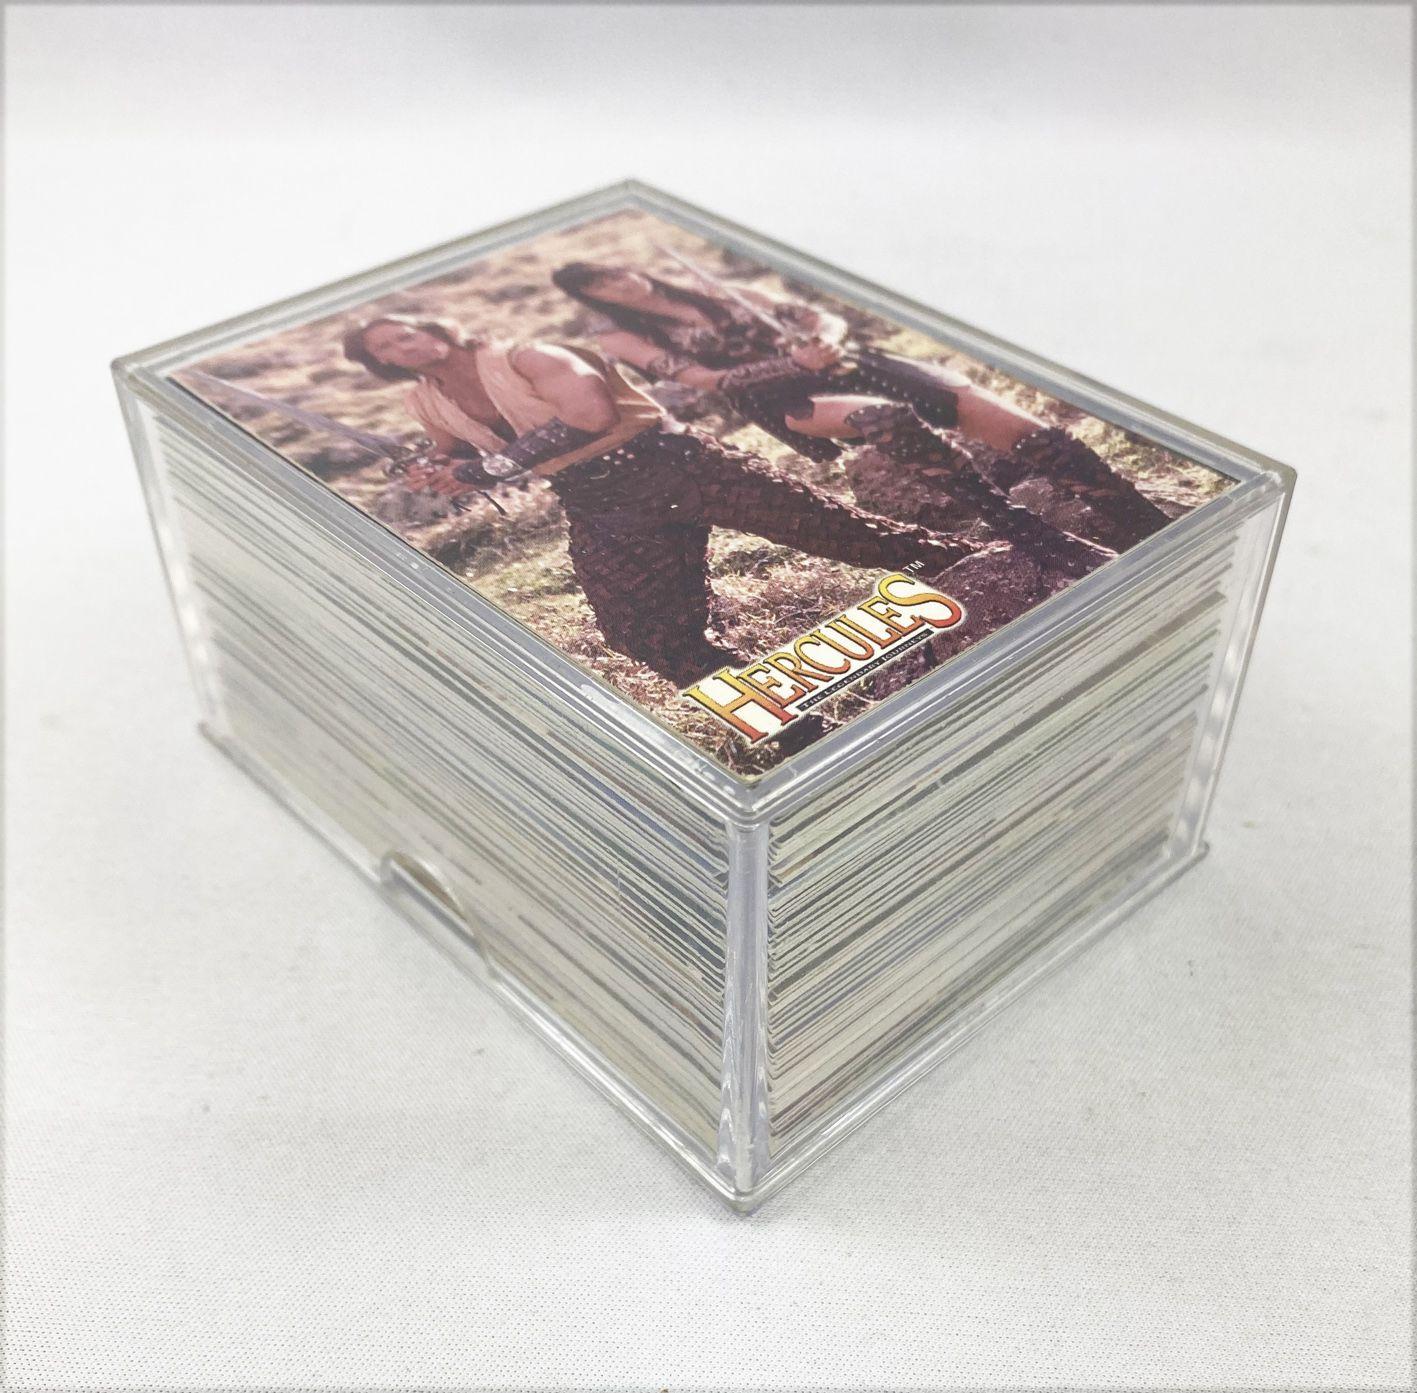 Hercules - Topps Trading Cards (1996) - Série complète de 90 cartes + 9 cartes relief + 2 Hologrammes